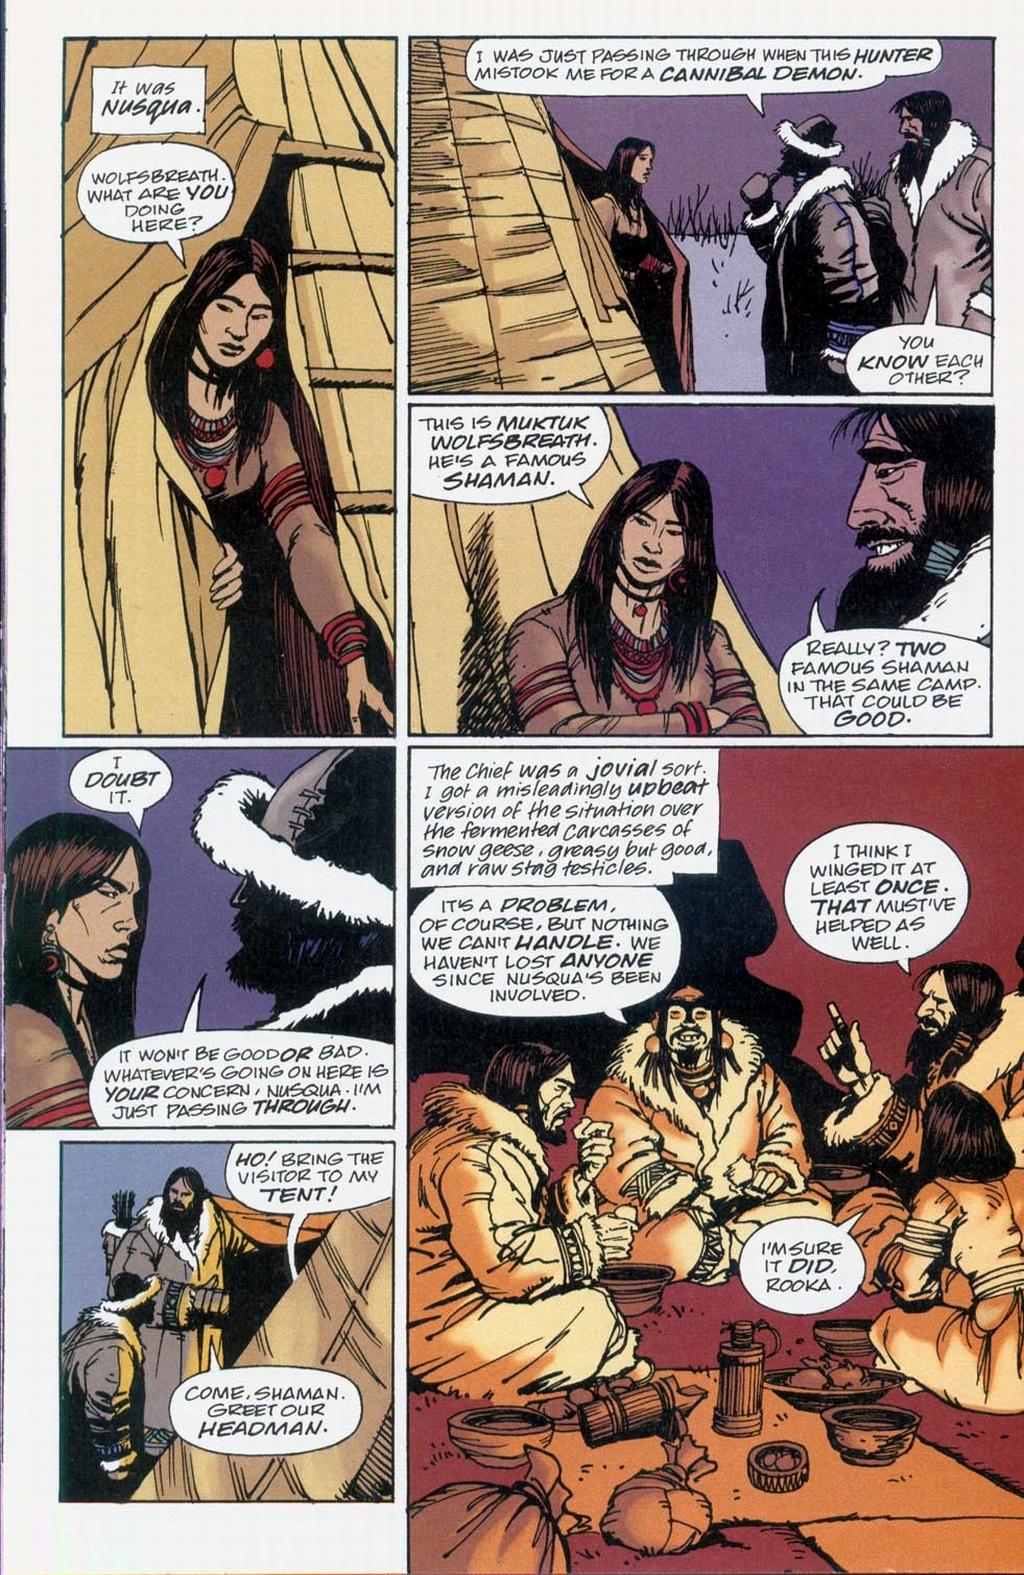 Muktuk Wolfsbreath: Hard-Boiled Shaman issue 1 - Page 10